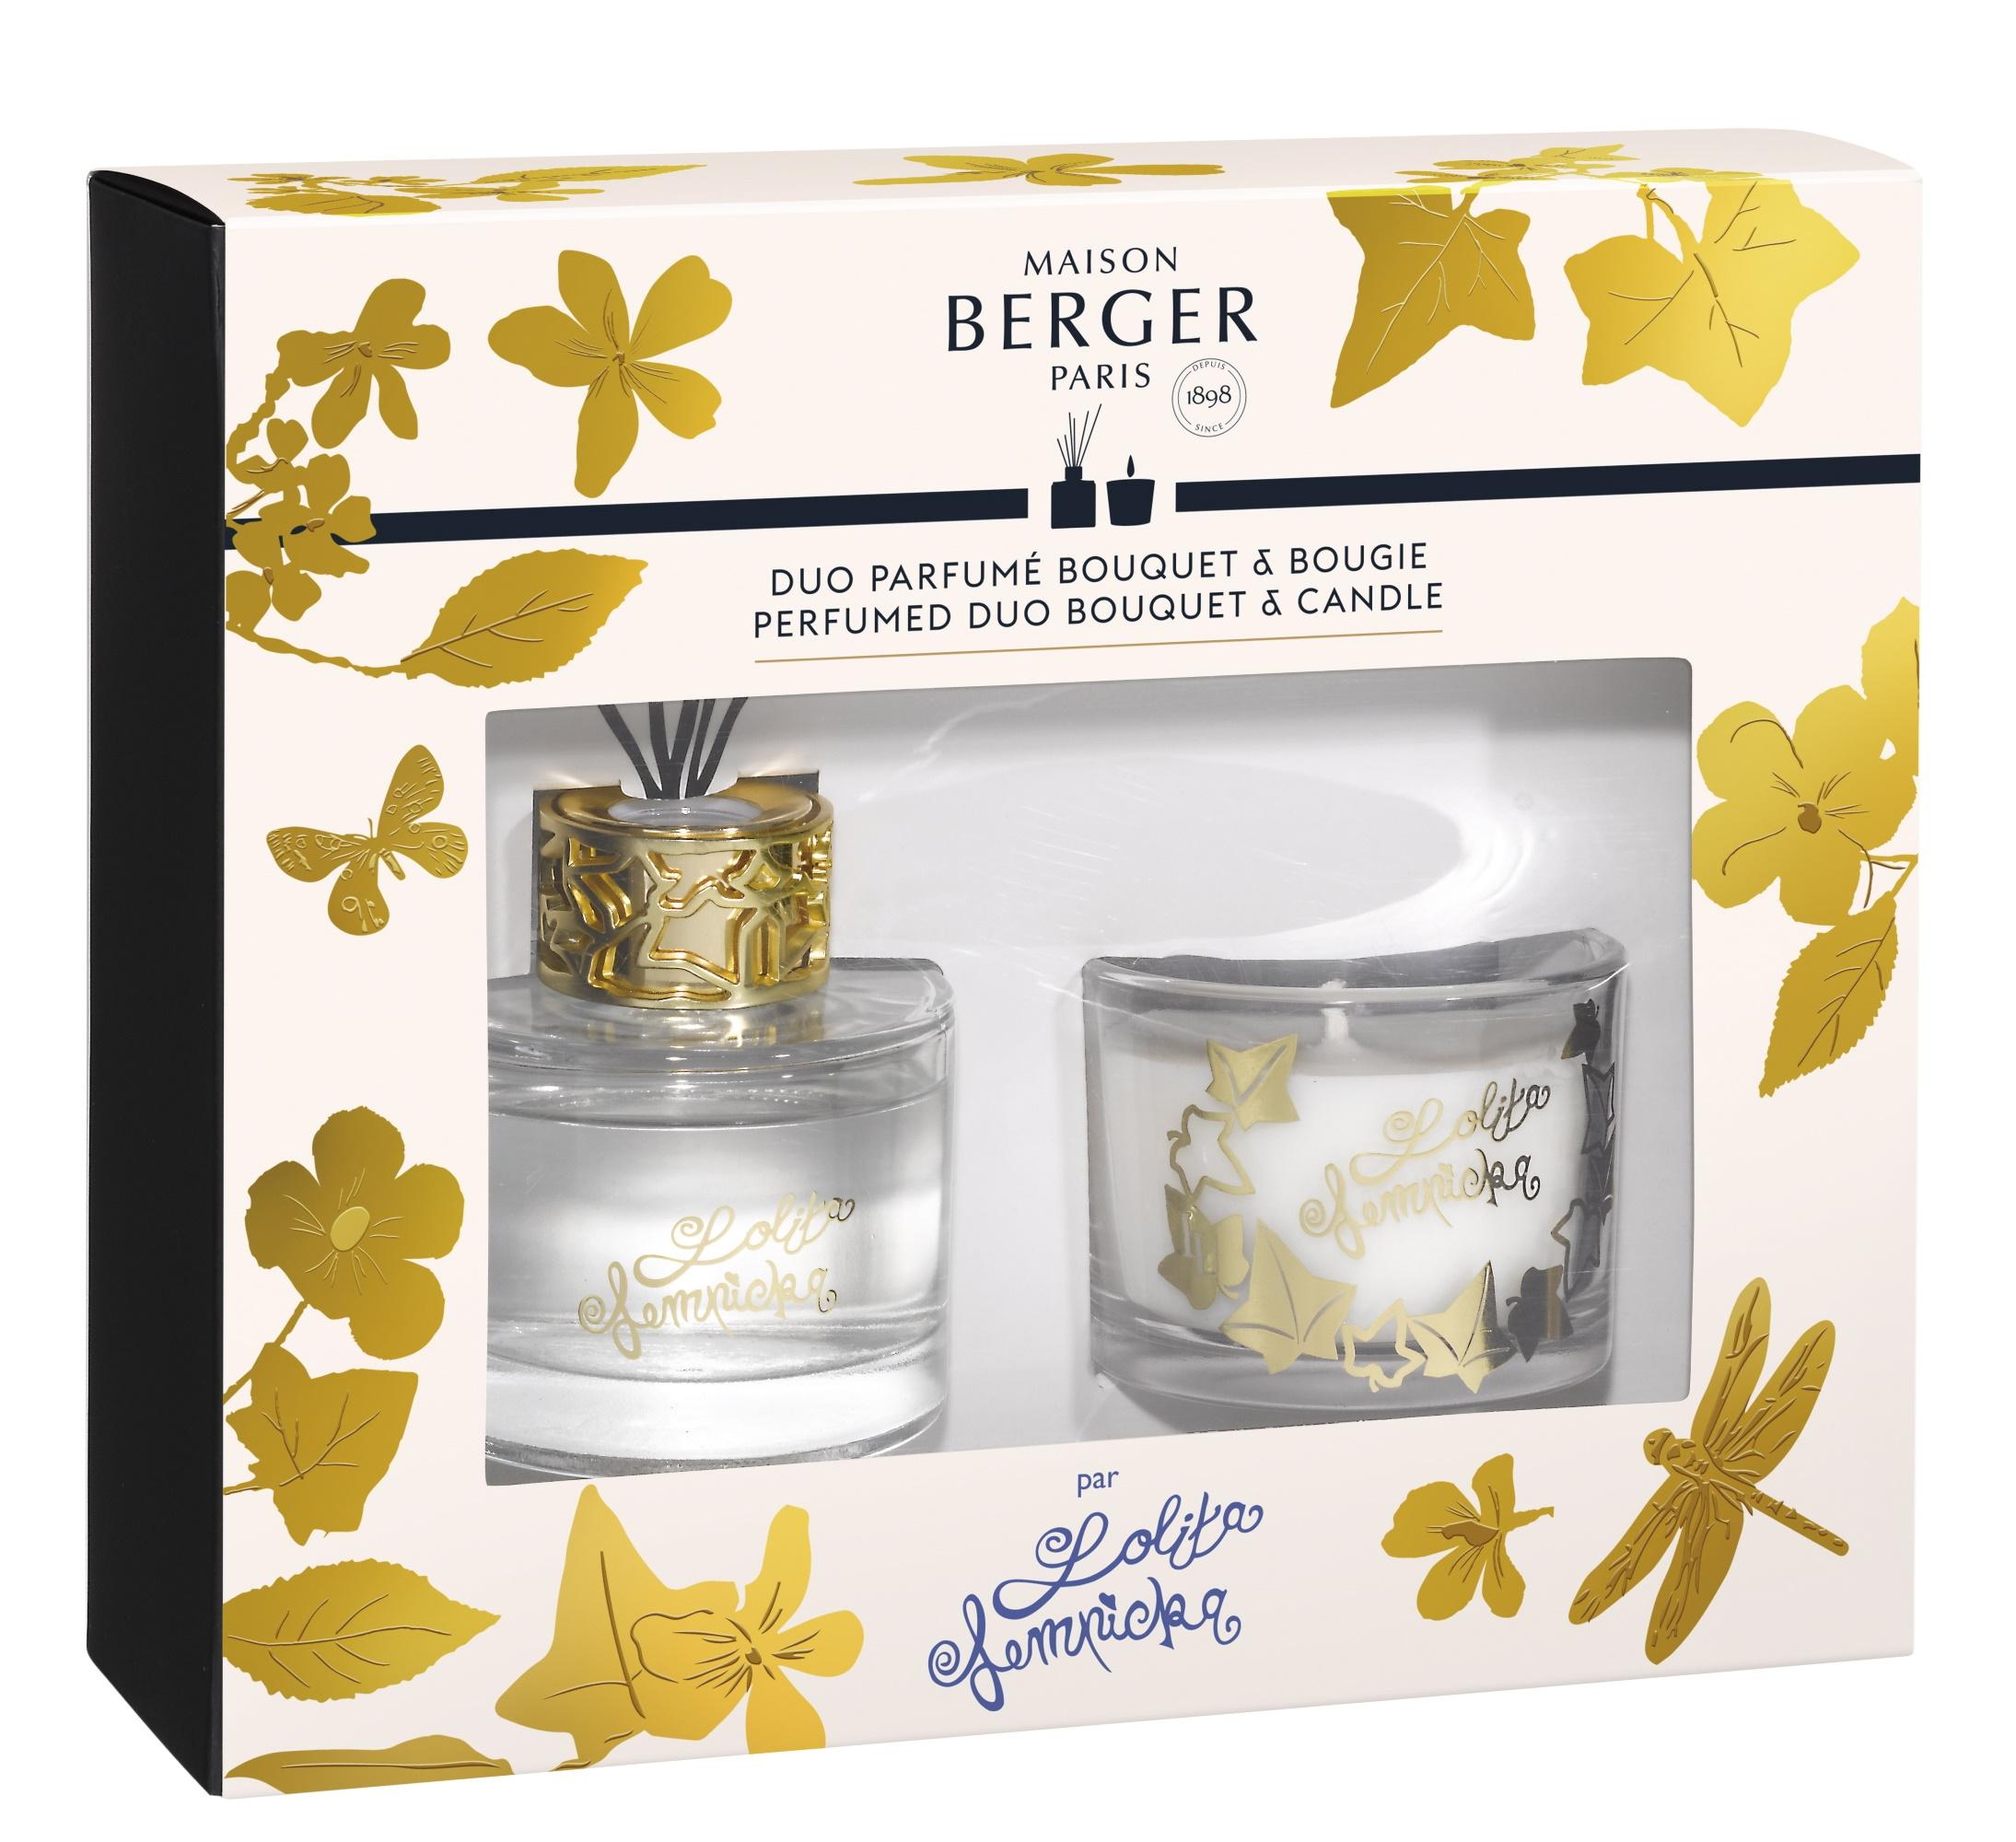 Set Berger Duo Lolita Lempicka Bouquet Parfume 80ml + lumanare parfumata 80g imagine